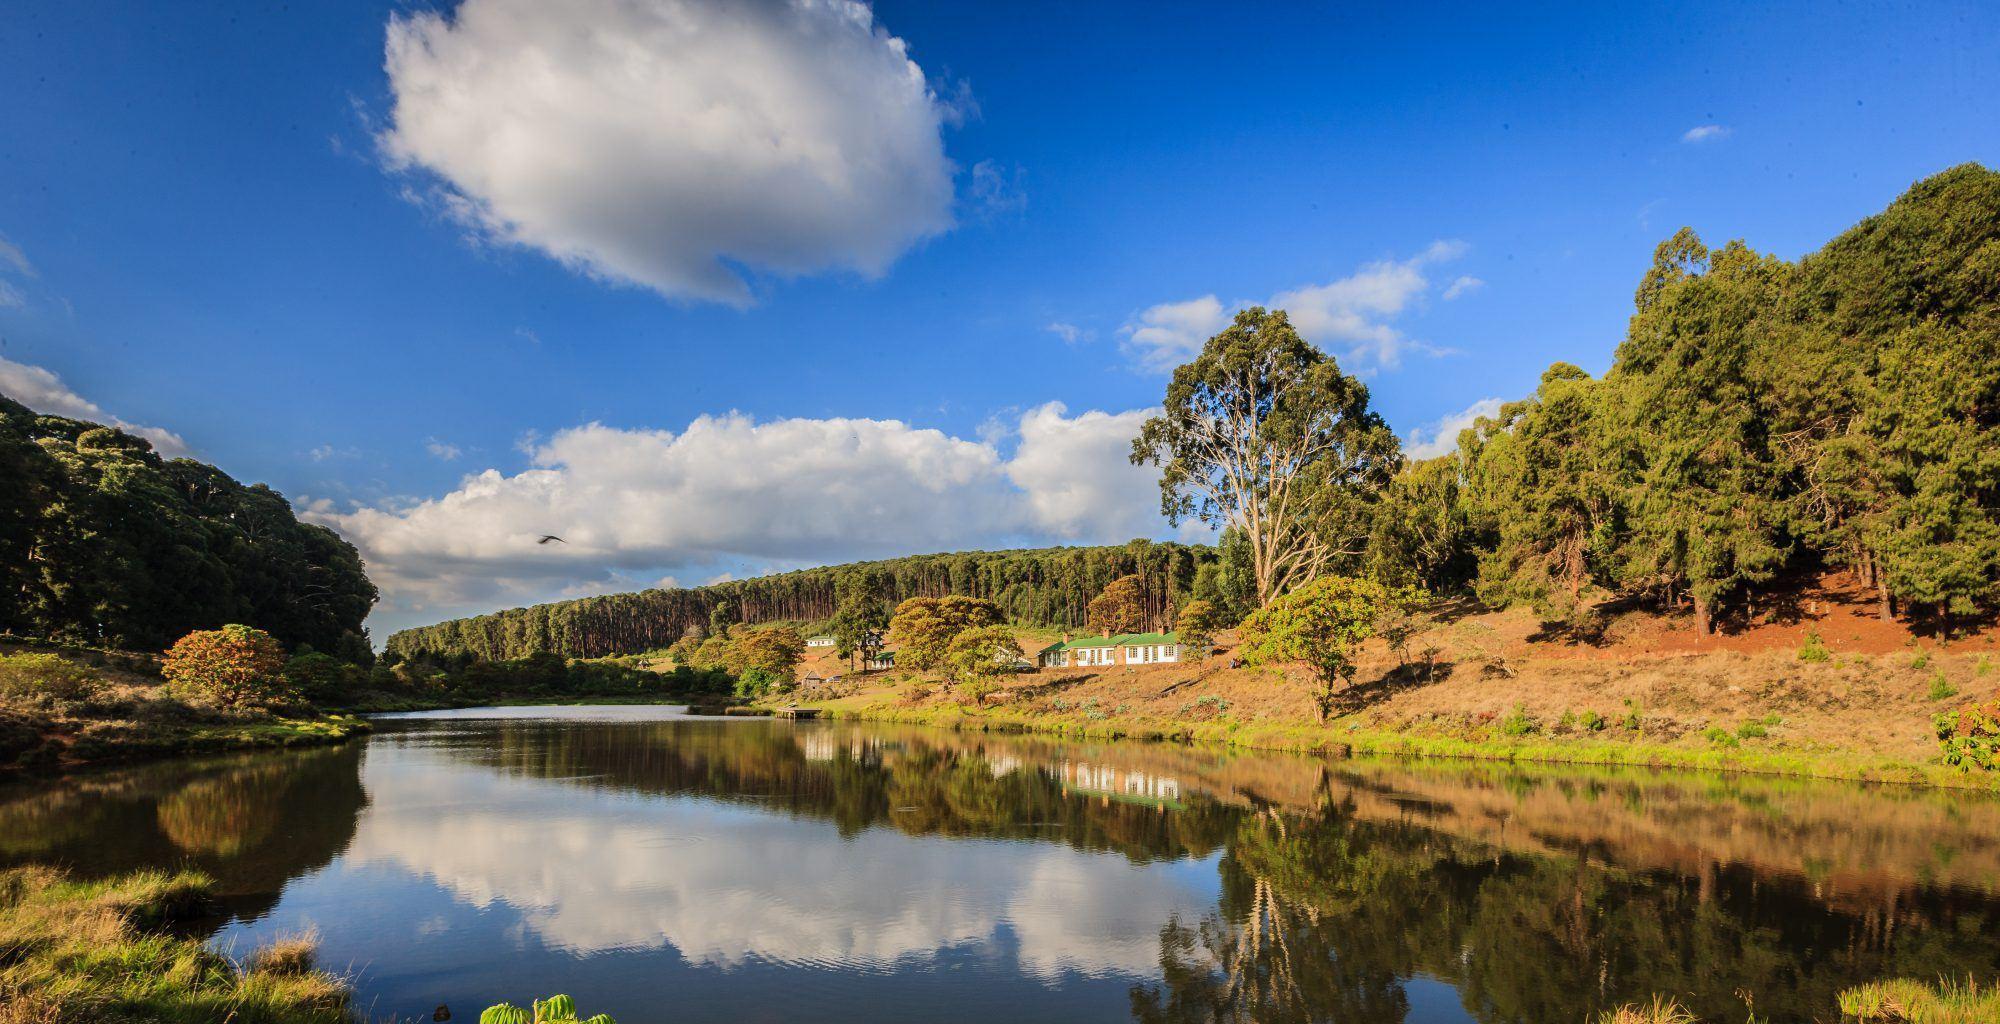 Malawi-Bentley-Palmer-Landscape